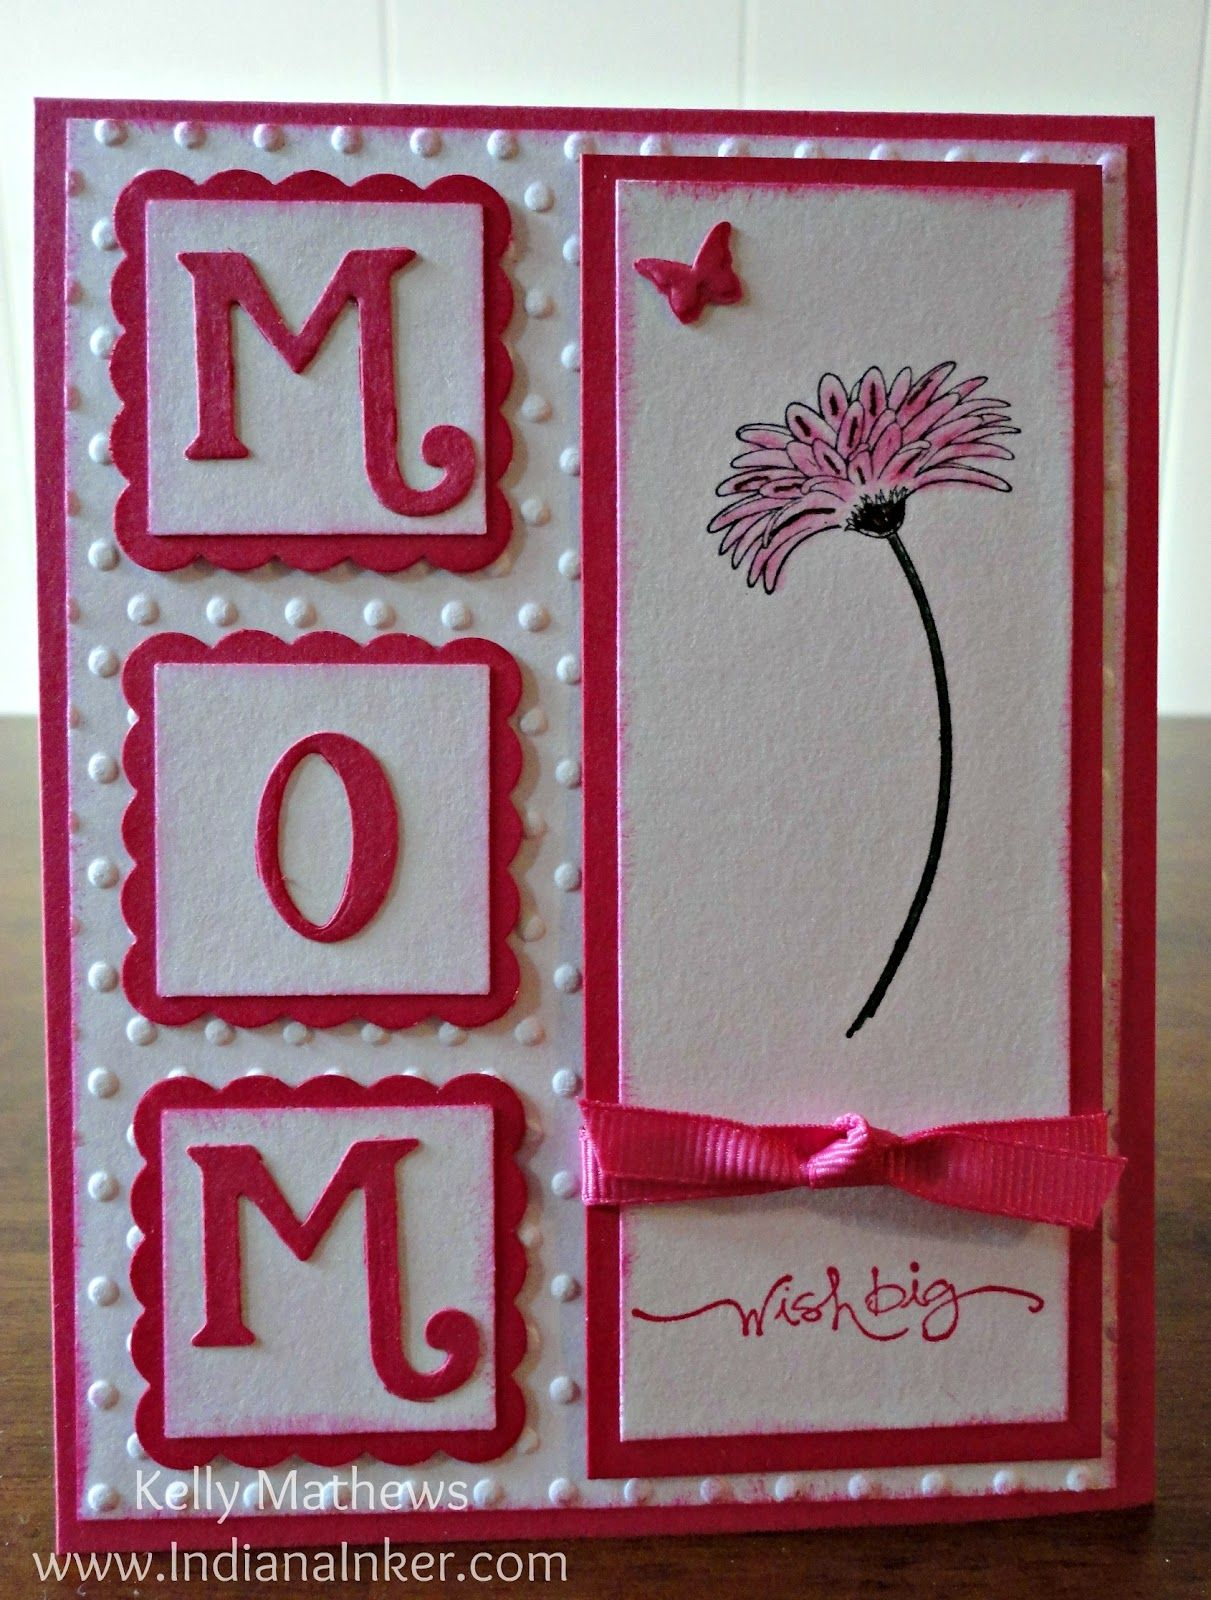 MomMbday2012JPG 1211 1600 pixels Card Ideas – Creative Birthday Card Ideas for Mom